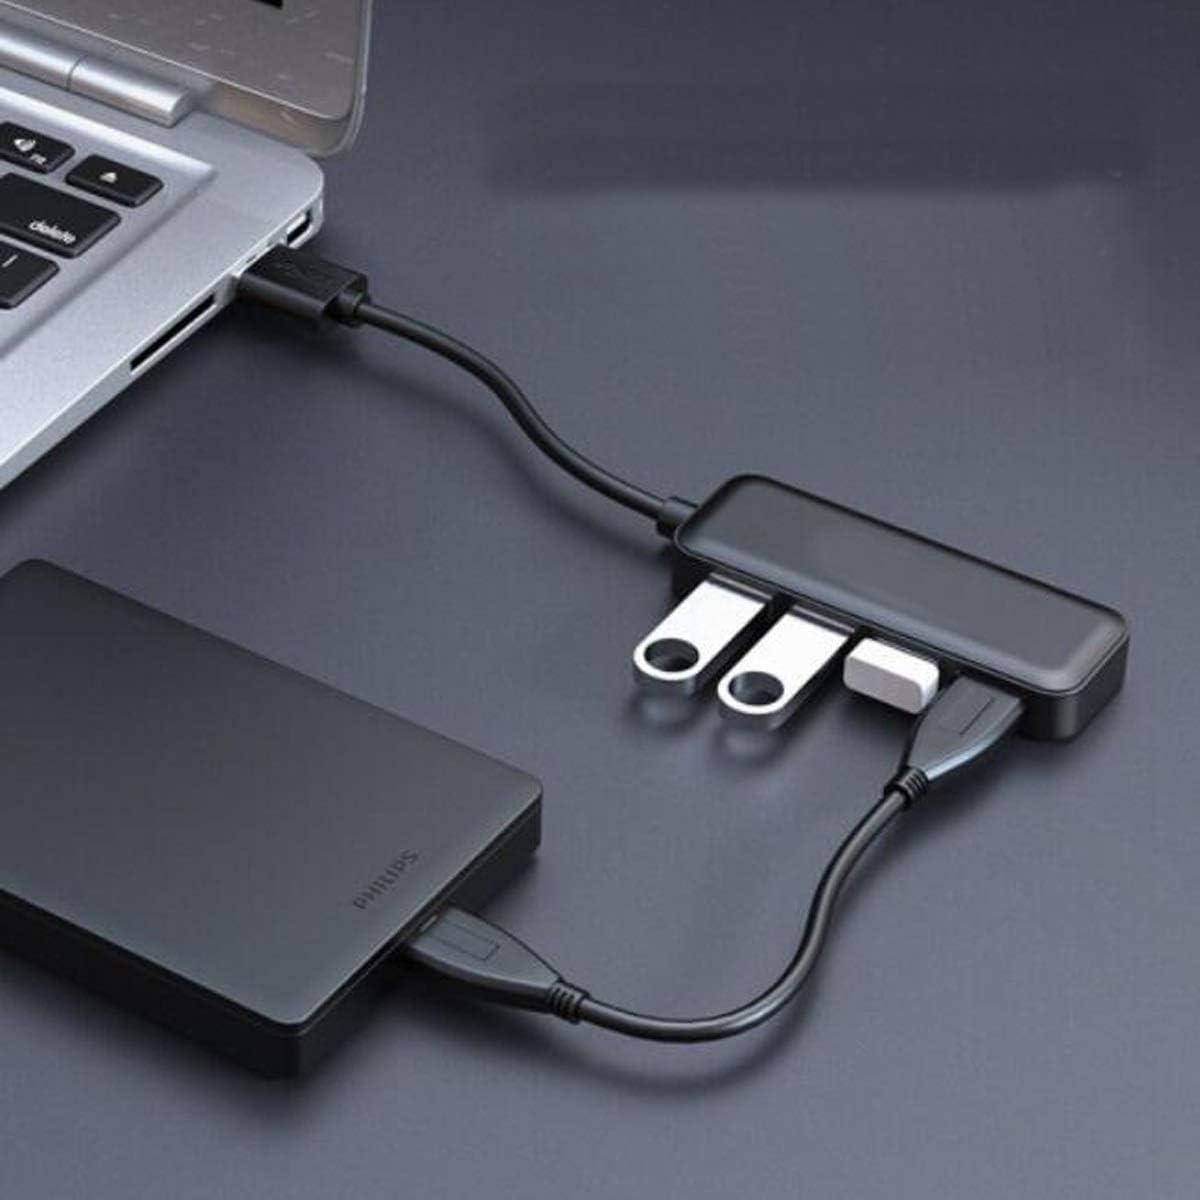 USB Splitter 3.0 High Speed Transmission Hub Hub Yougou Hub Color : Black, Size : 0.2 m Line Length 20 cm Solid